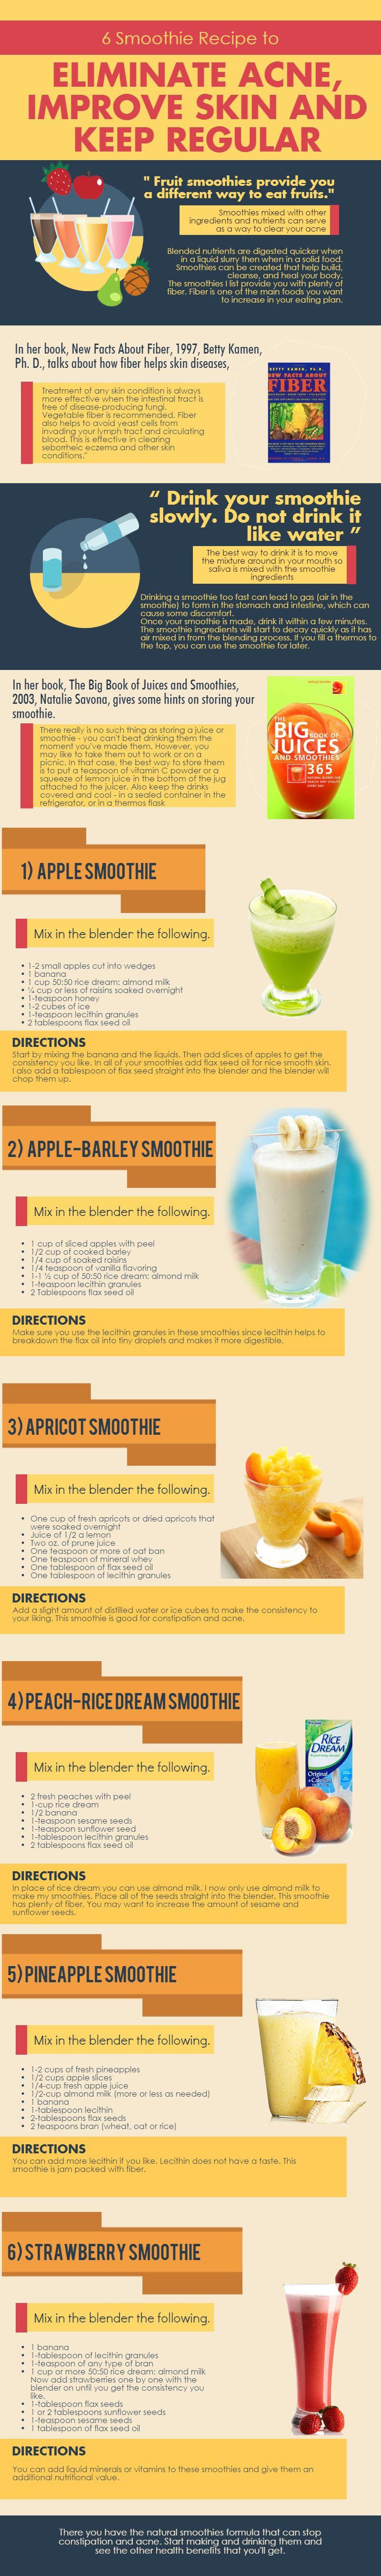 6 Best Smoothie For Constipation & Keeping Bowel Regular Movement